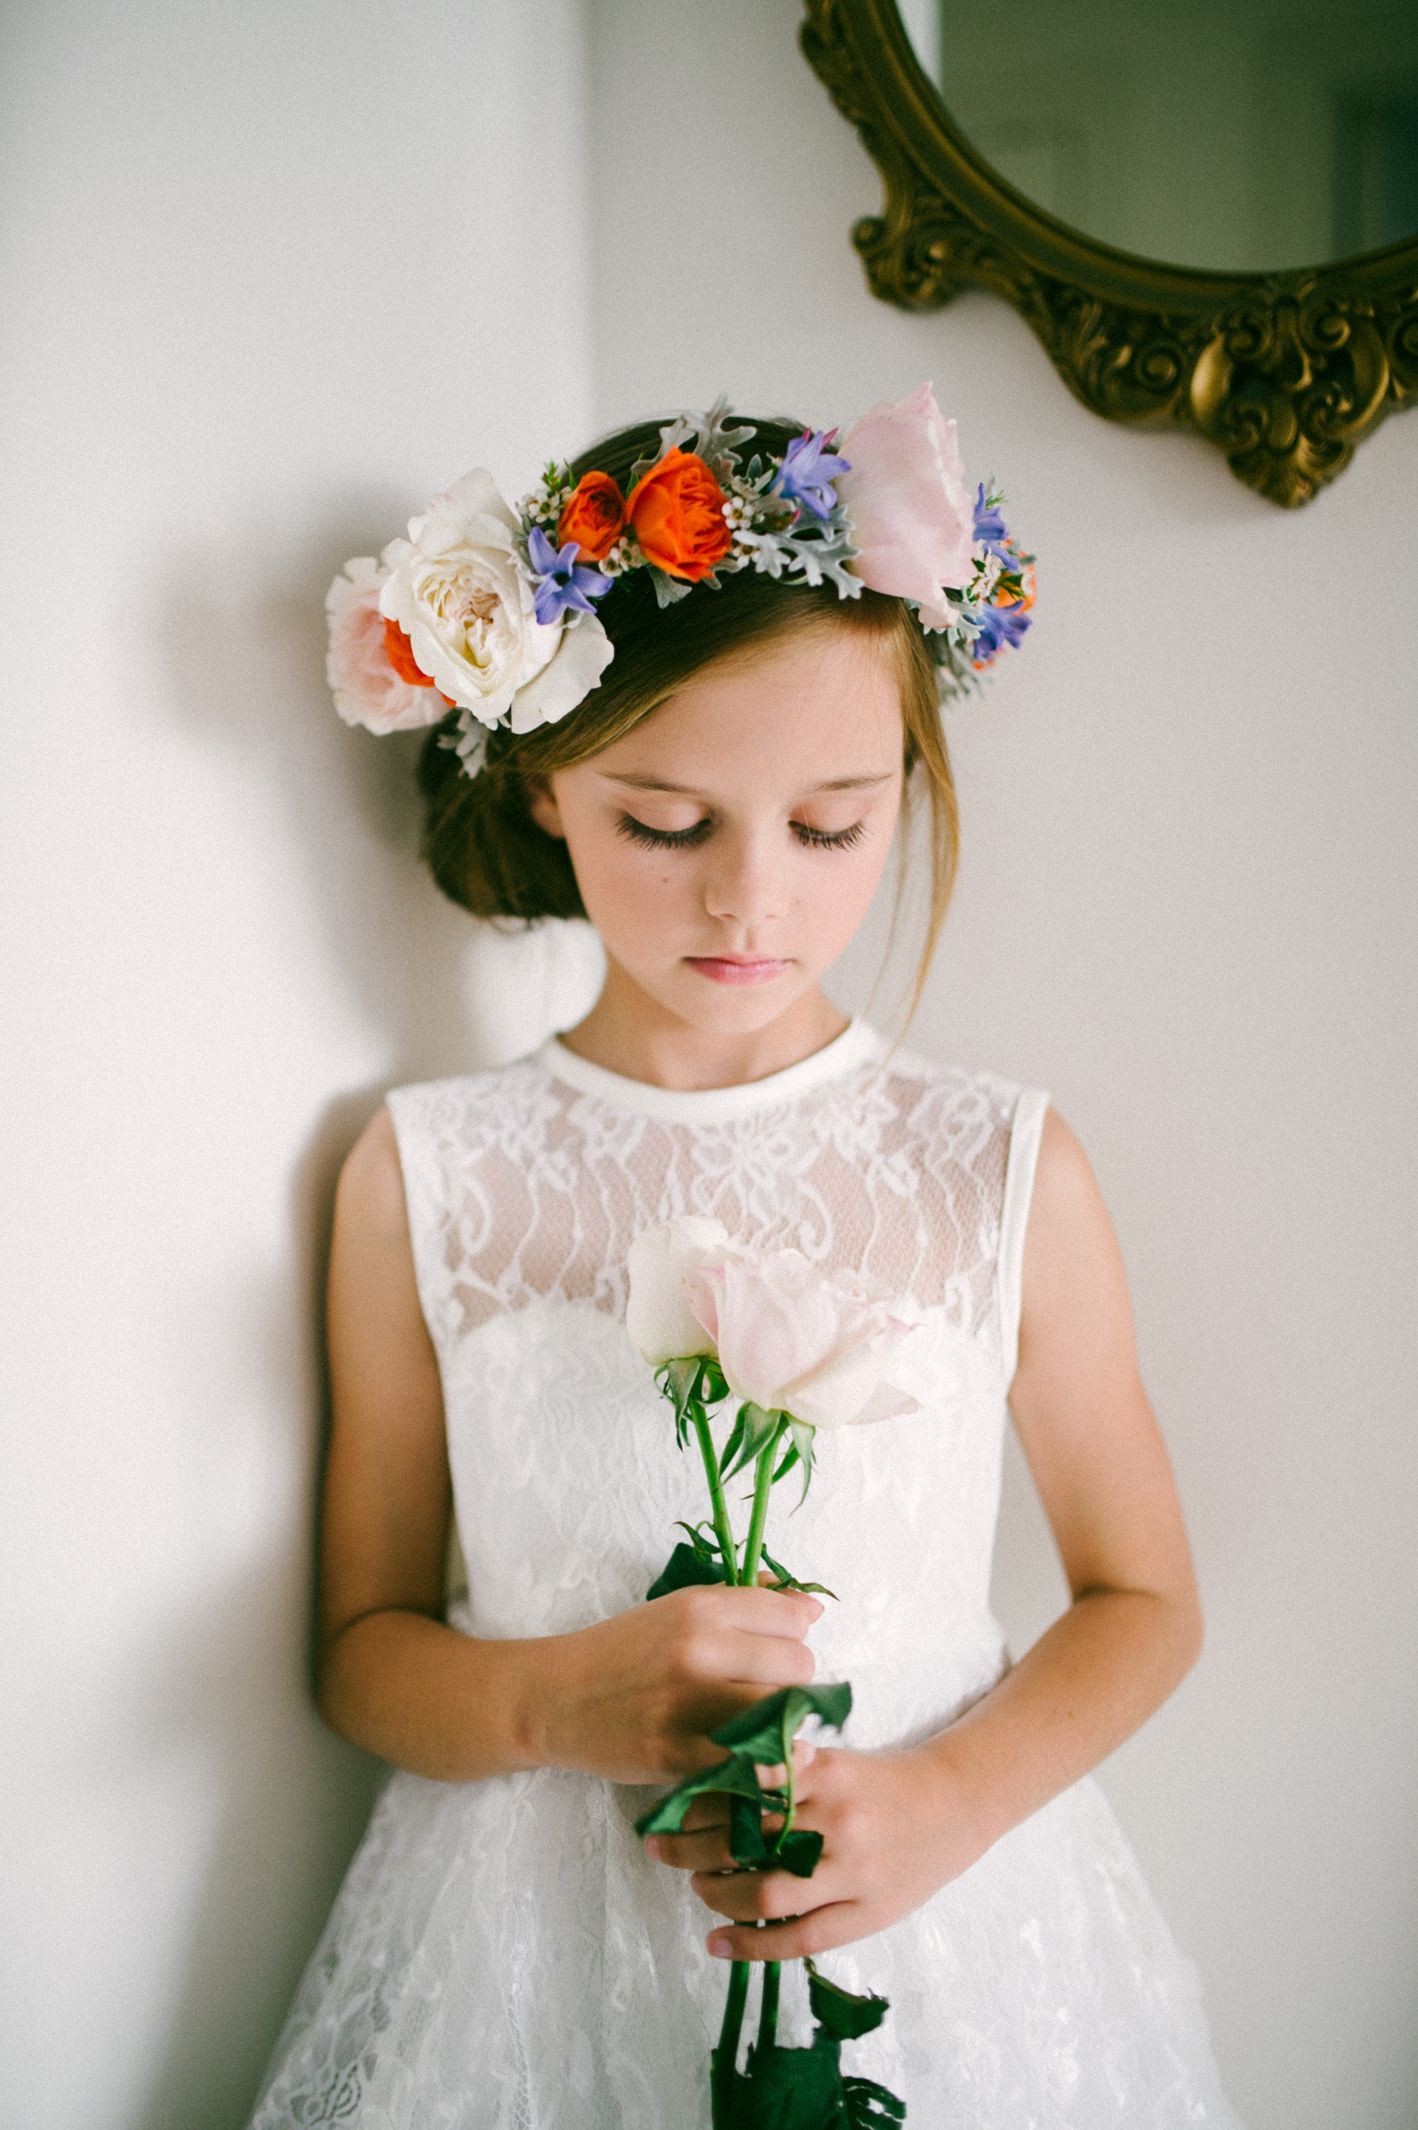 006-crown-of-eden-sophie-baker-photography